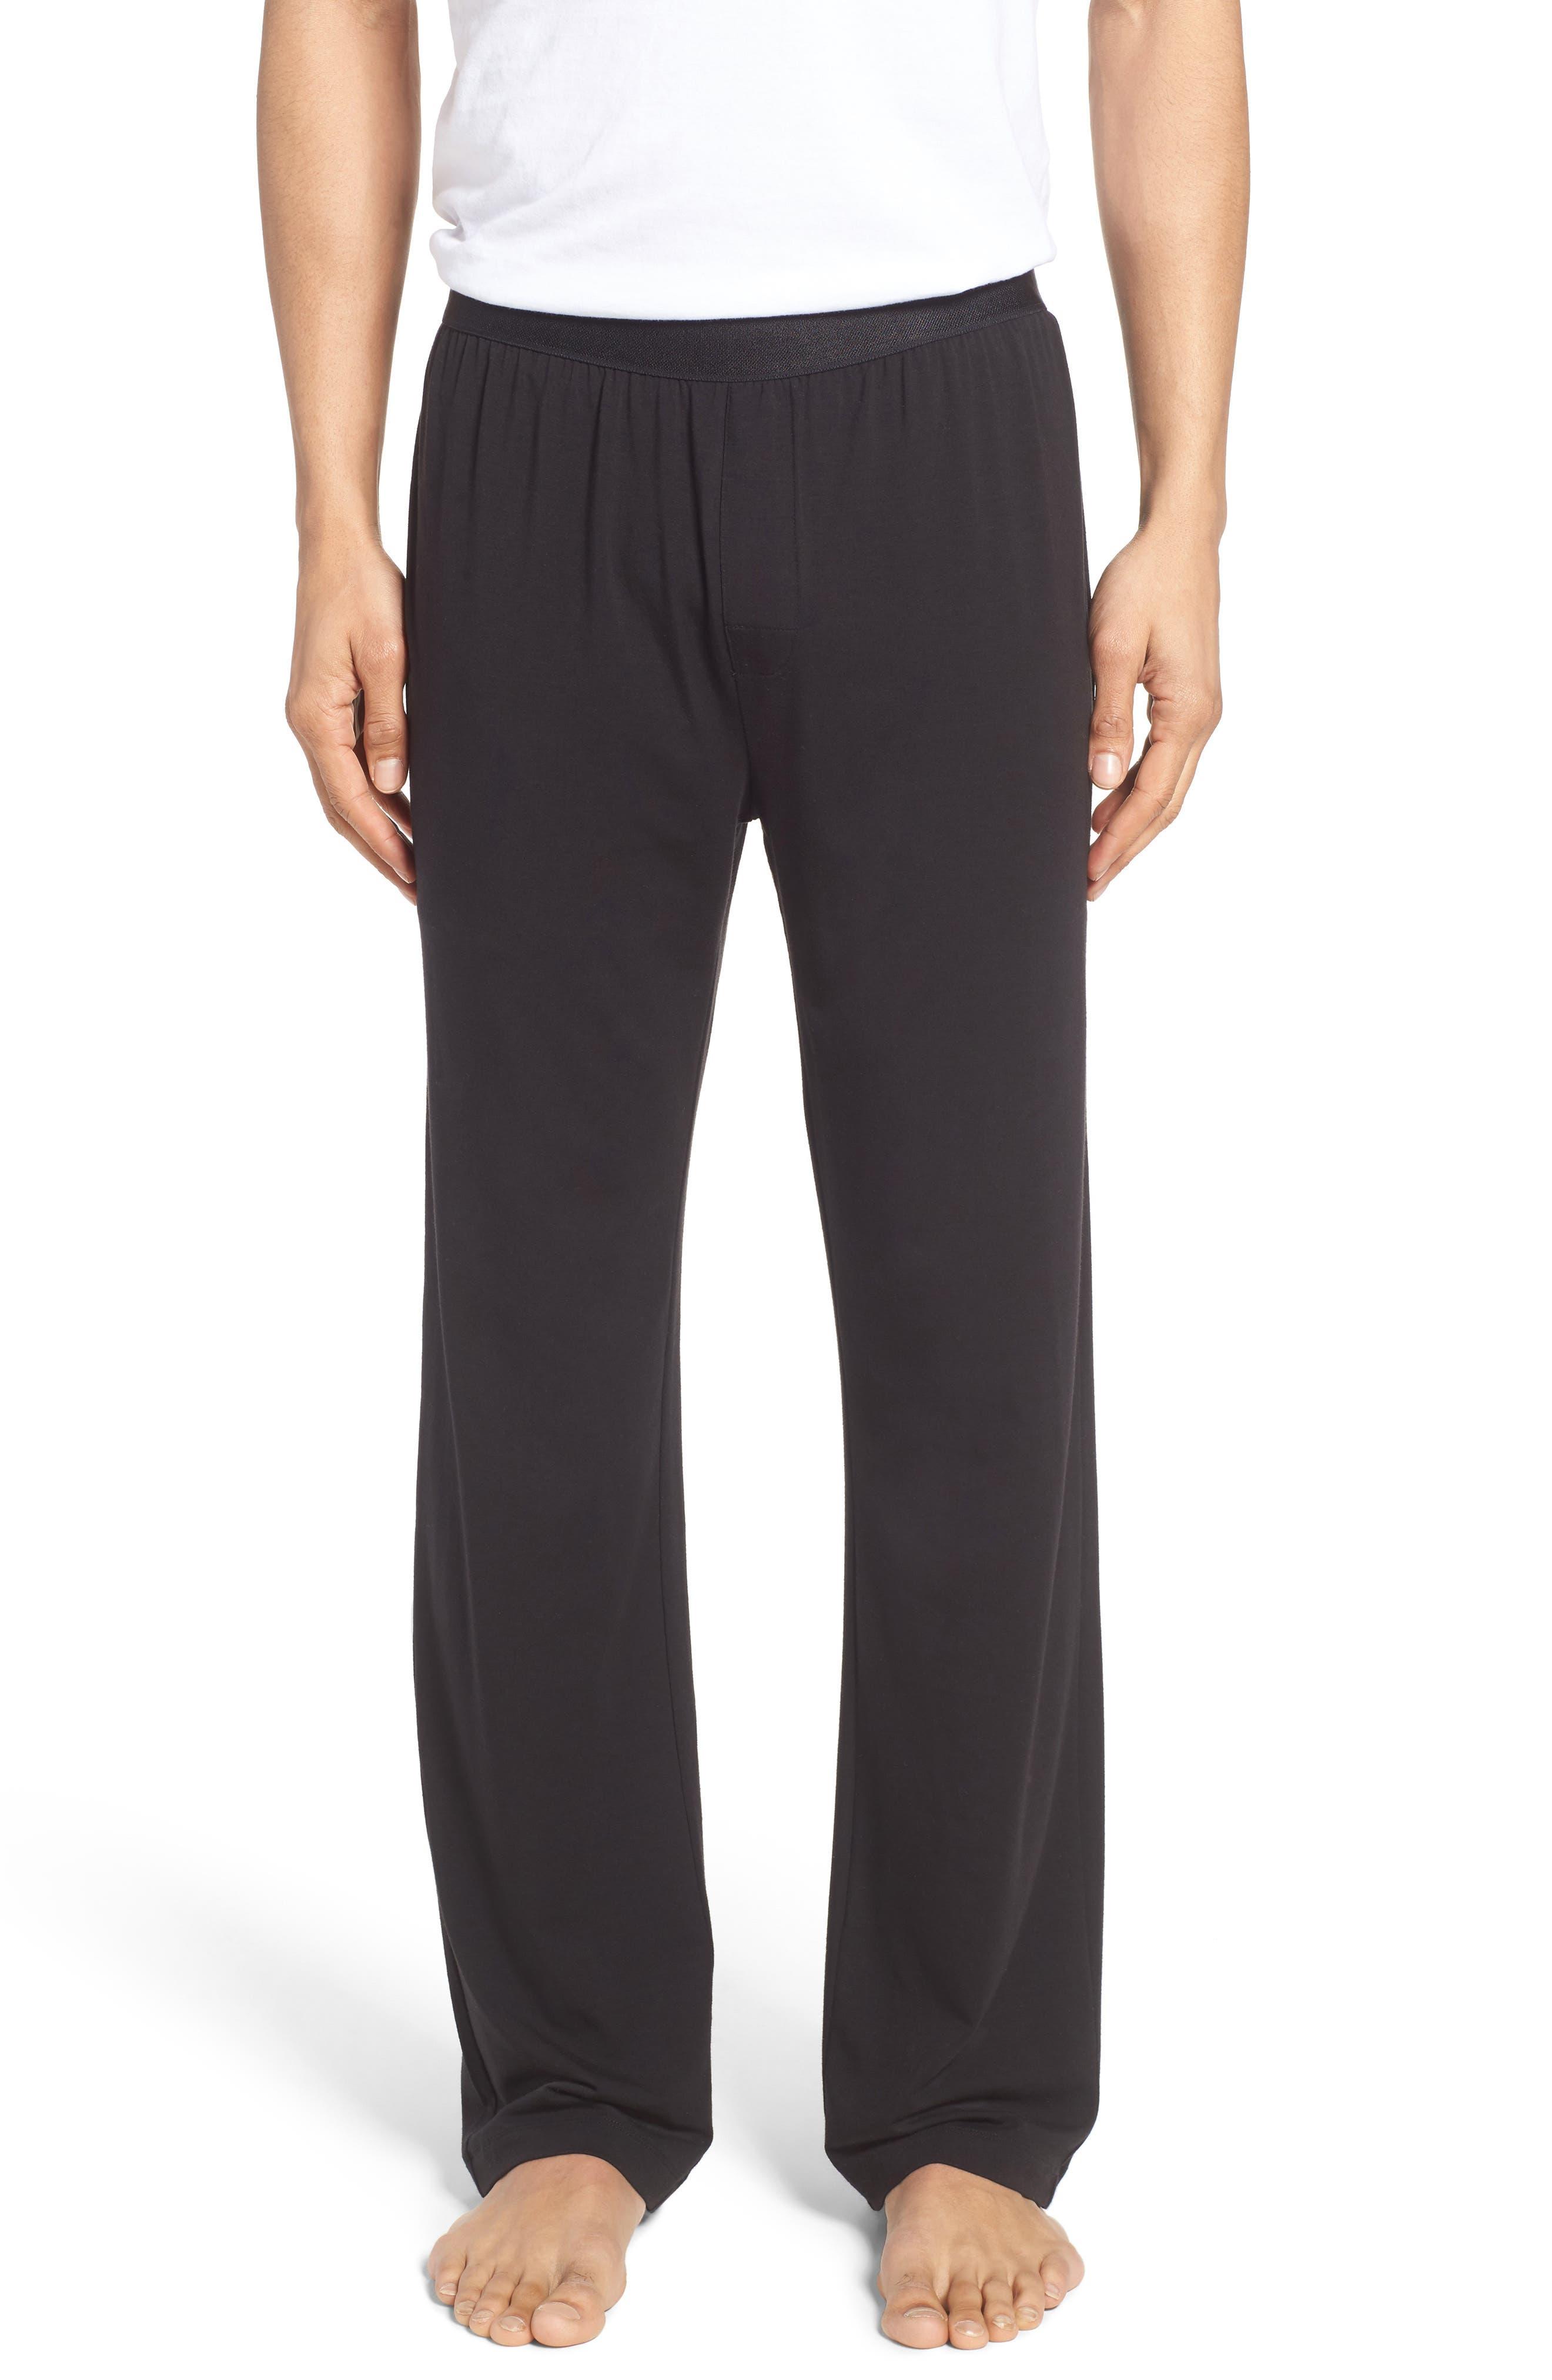 Micromodal Blend Lounge Pants,                             Main thumbnail 1, color,                             Black